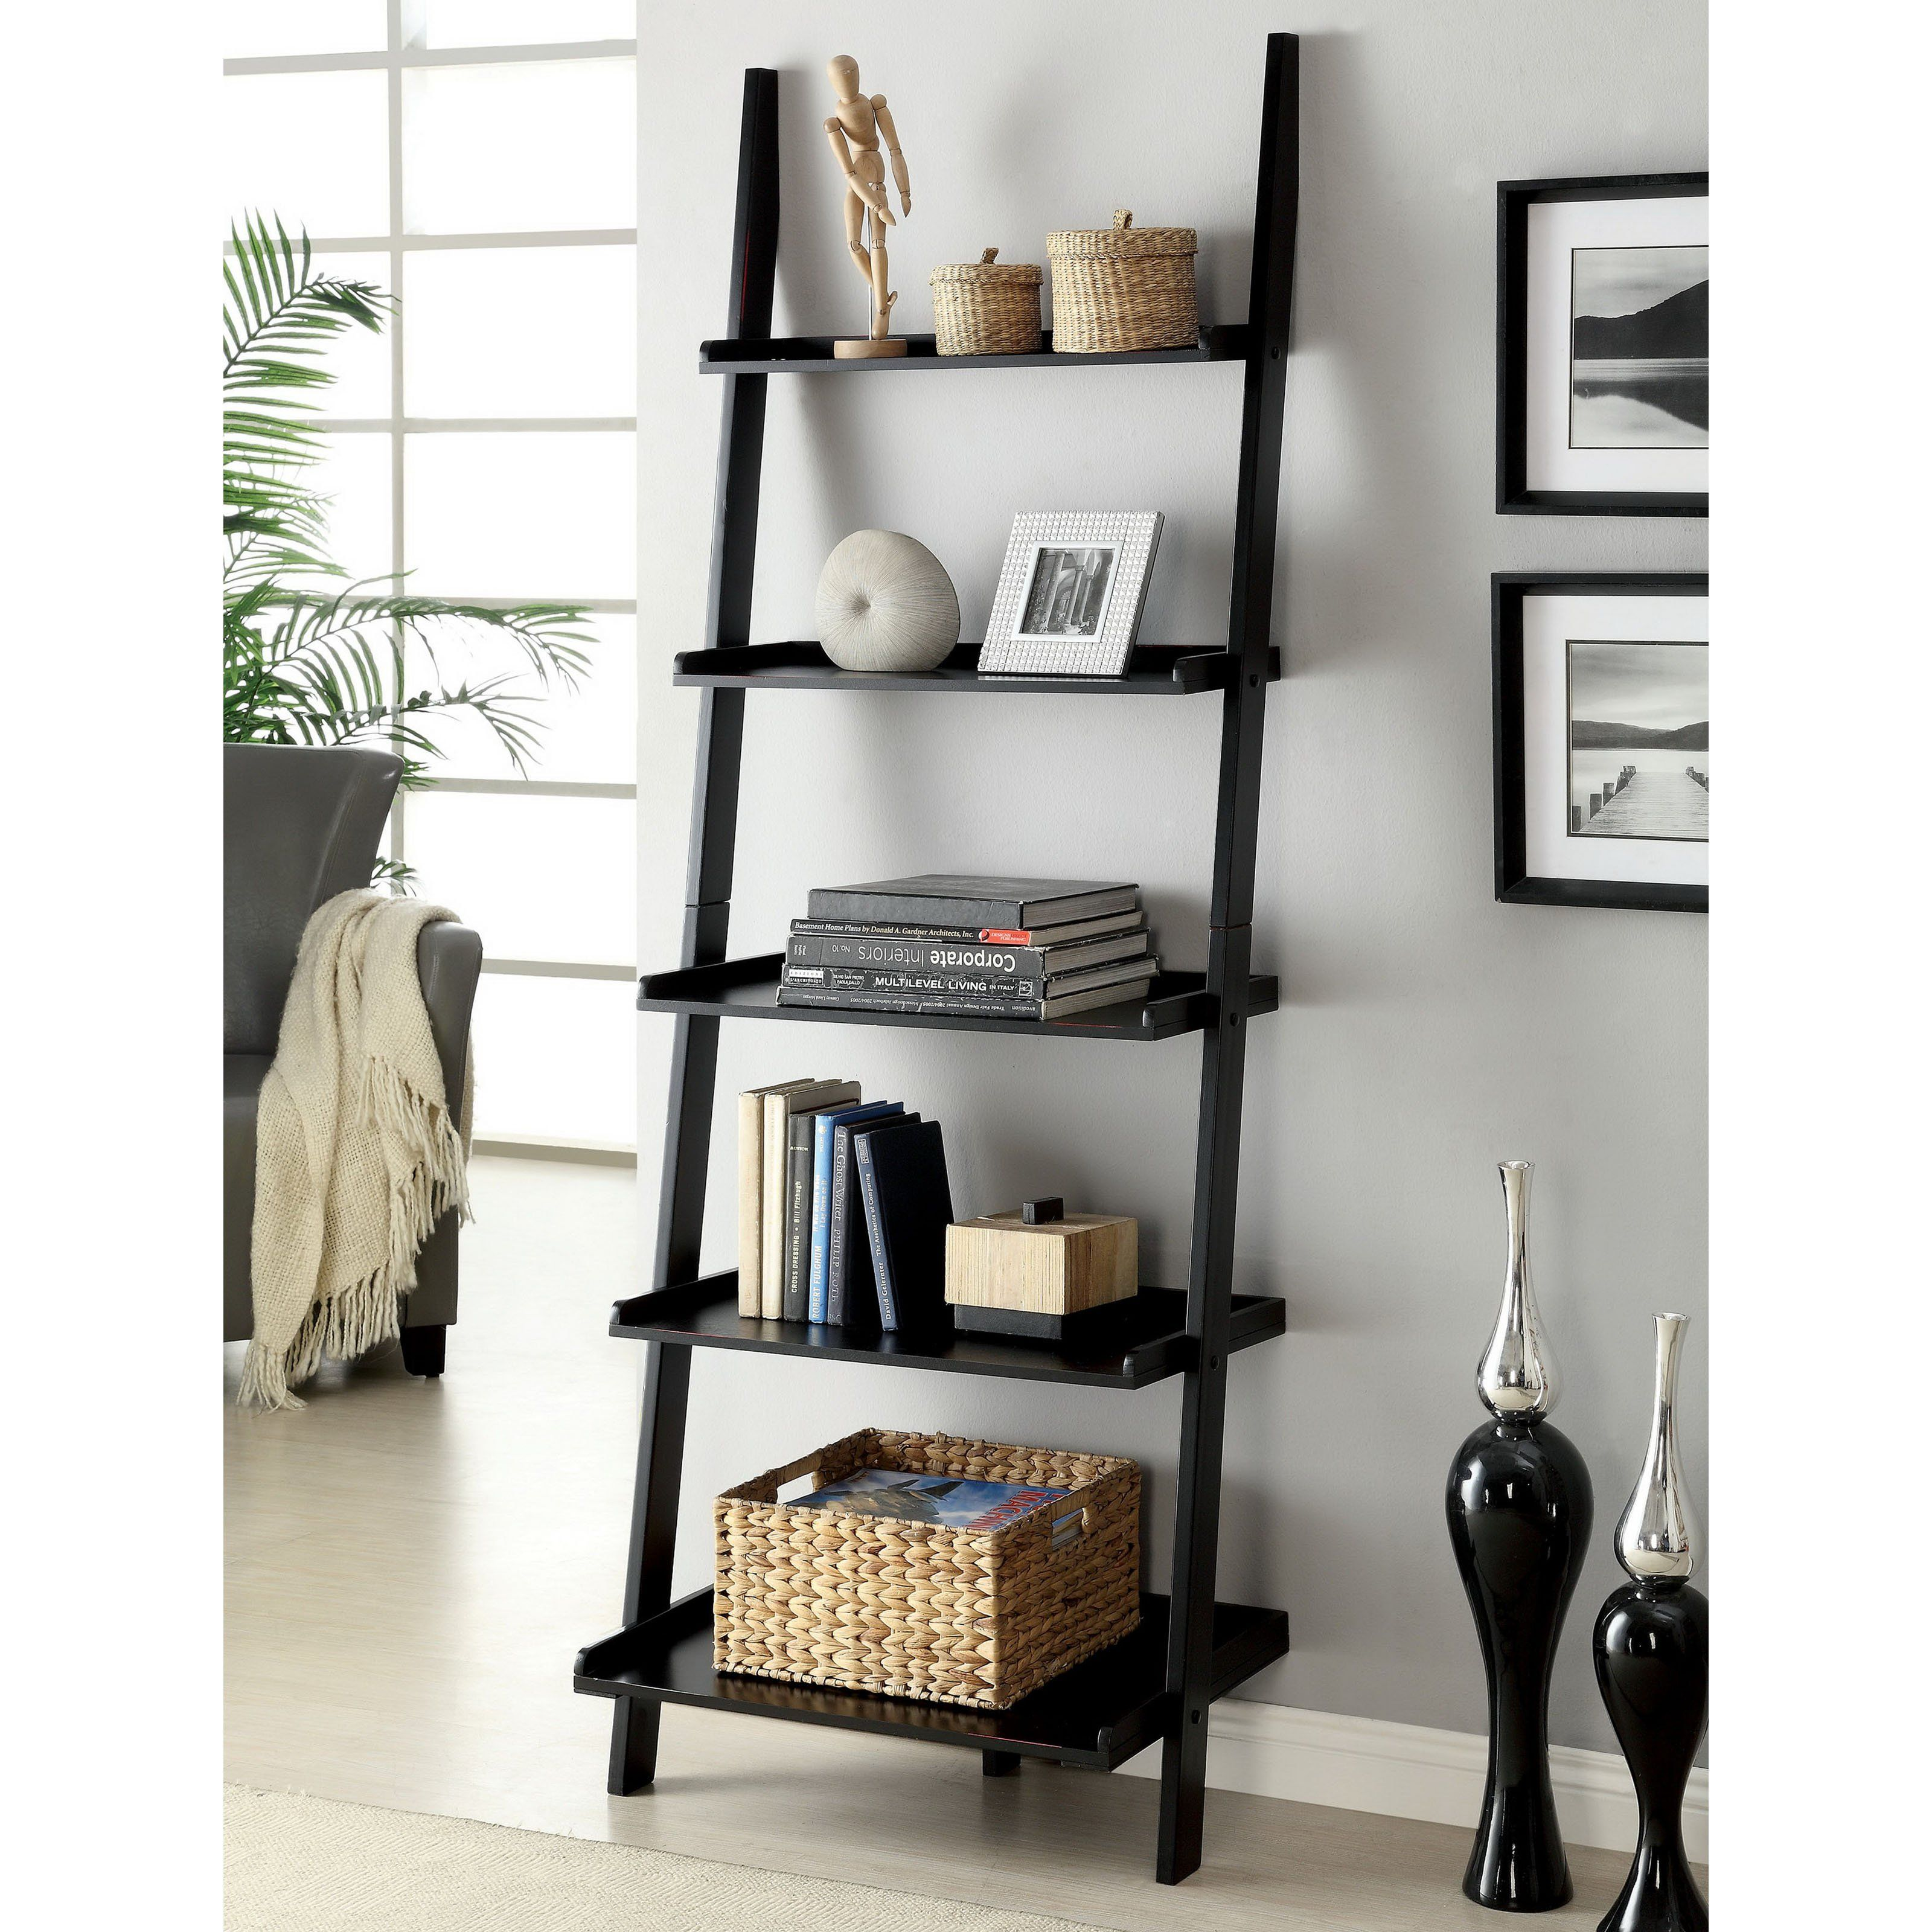 43 Very Inspiring And Creative Bookshelf Decorating Ideas Ladder